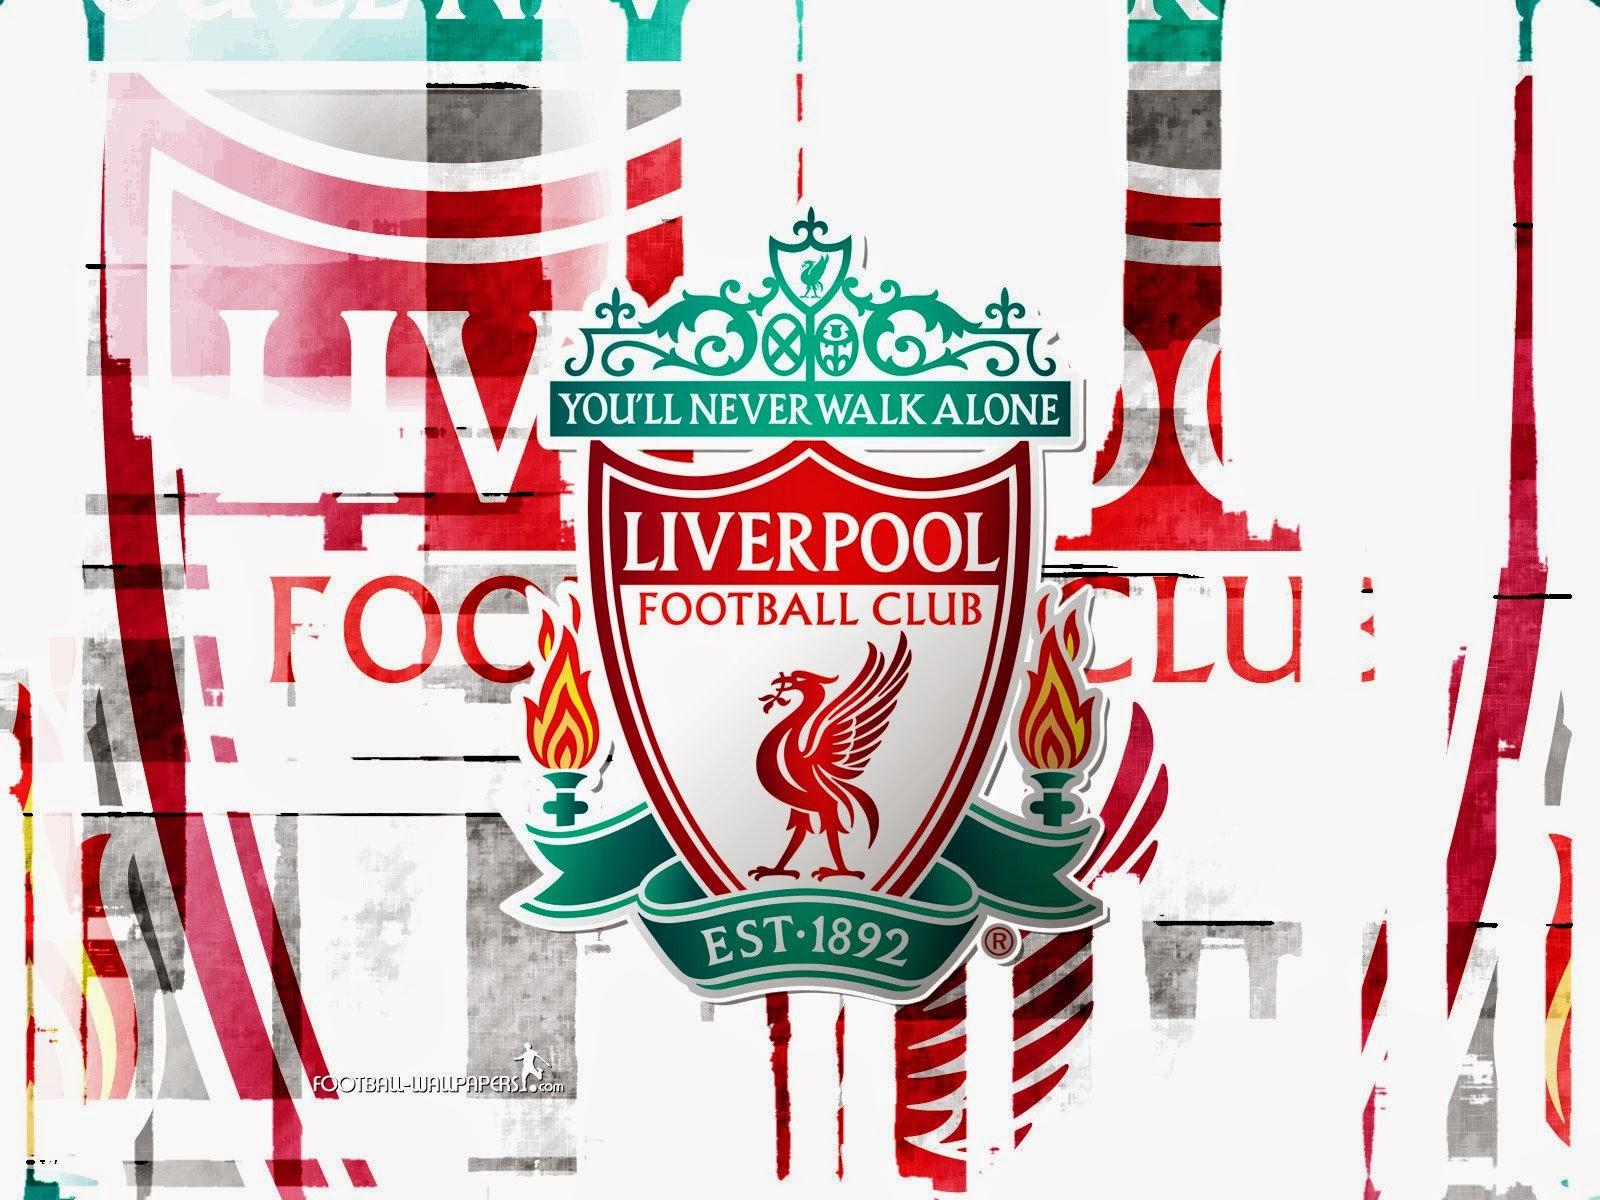 Liverpool Fc Bedroom Wallpaper Liverpool Football Club Wallpaper Football Wallpaper Hd